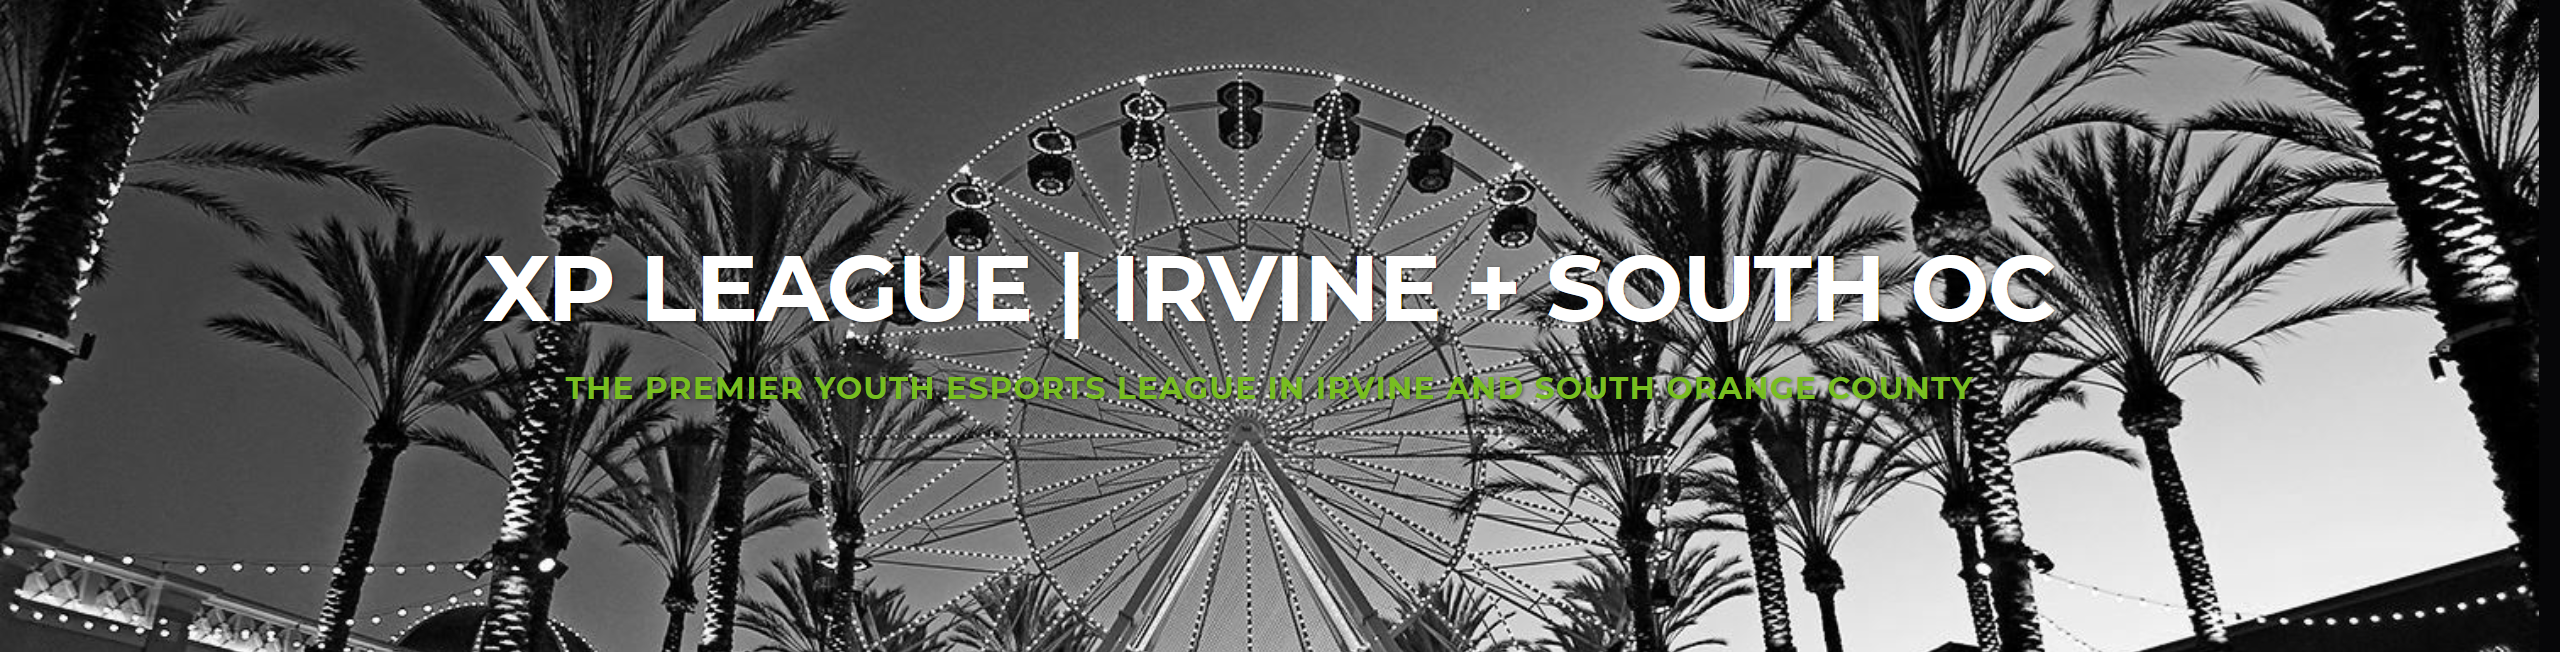 Background XP League Irvine & South Orange County